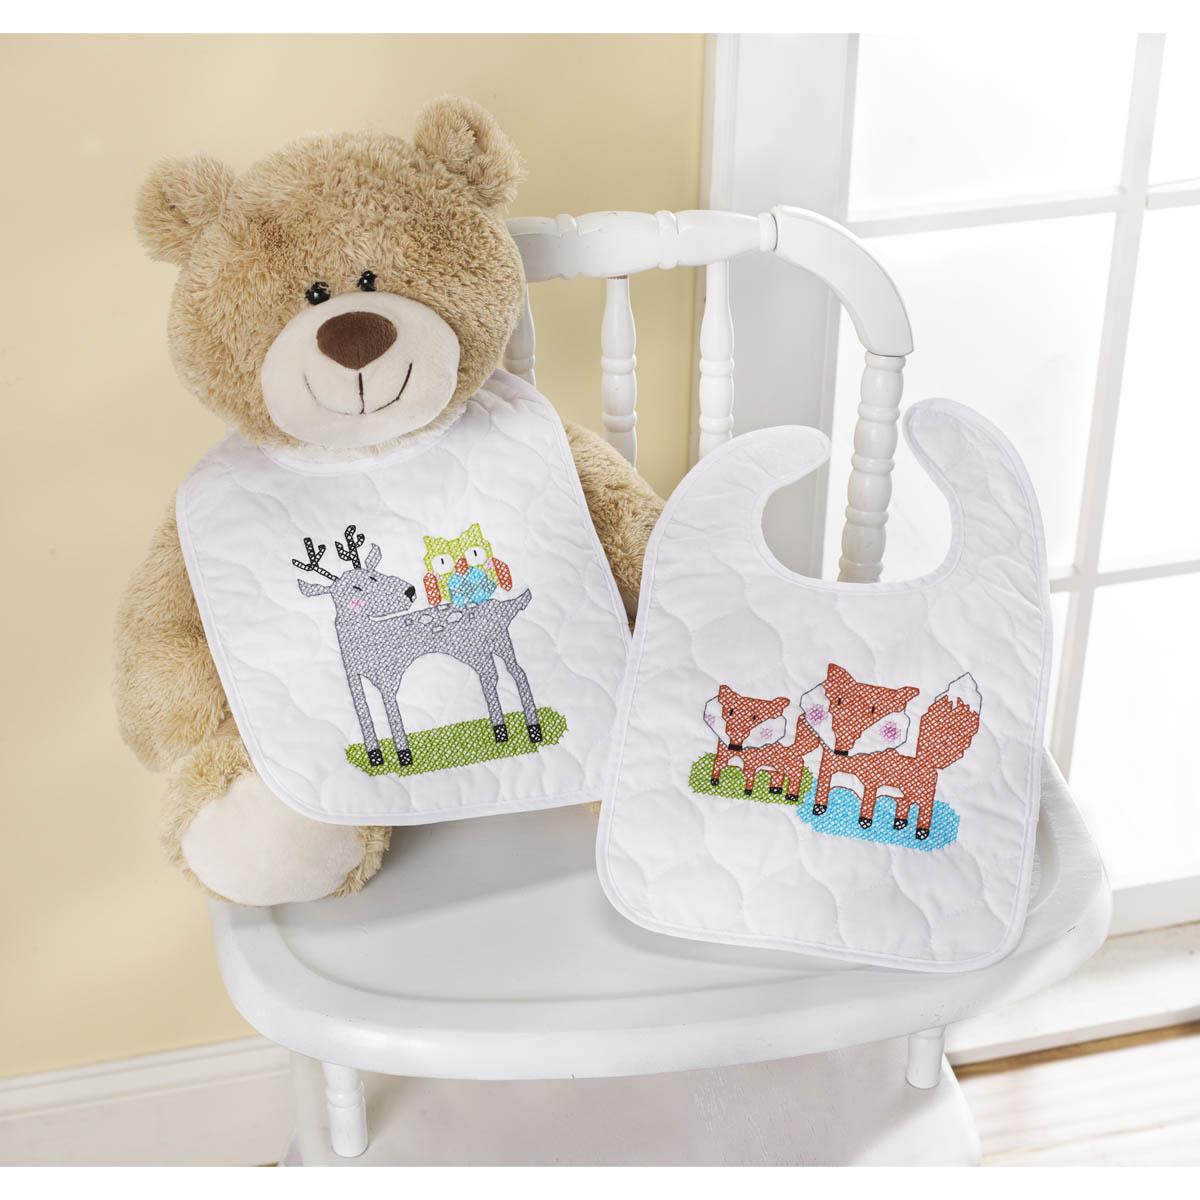 Bucilla ® Baby - Stamped Cross Stitch - Crib Ensembles - BFF - Bib Pair Kit